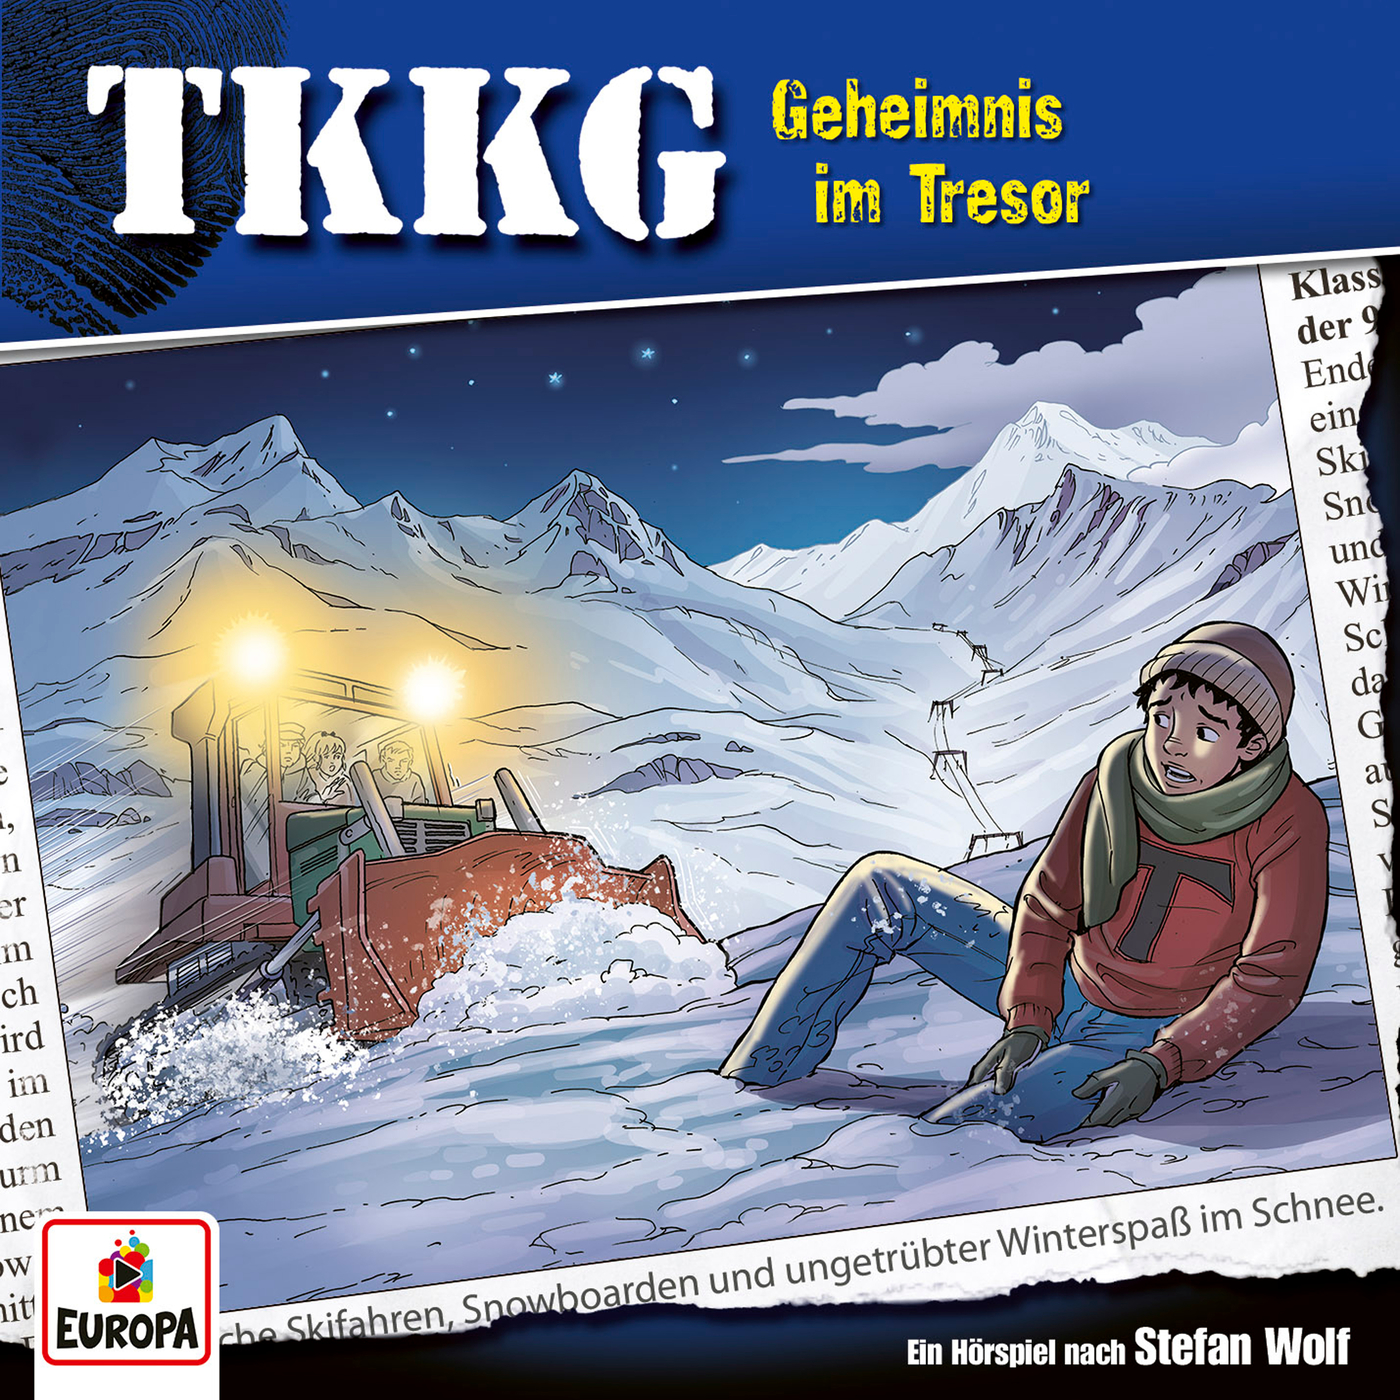 208/Geheimnis im Tresor - TKKG